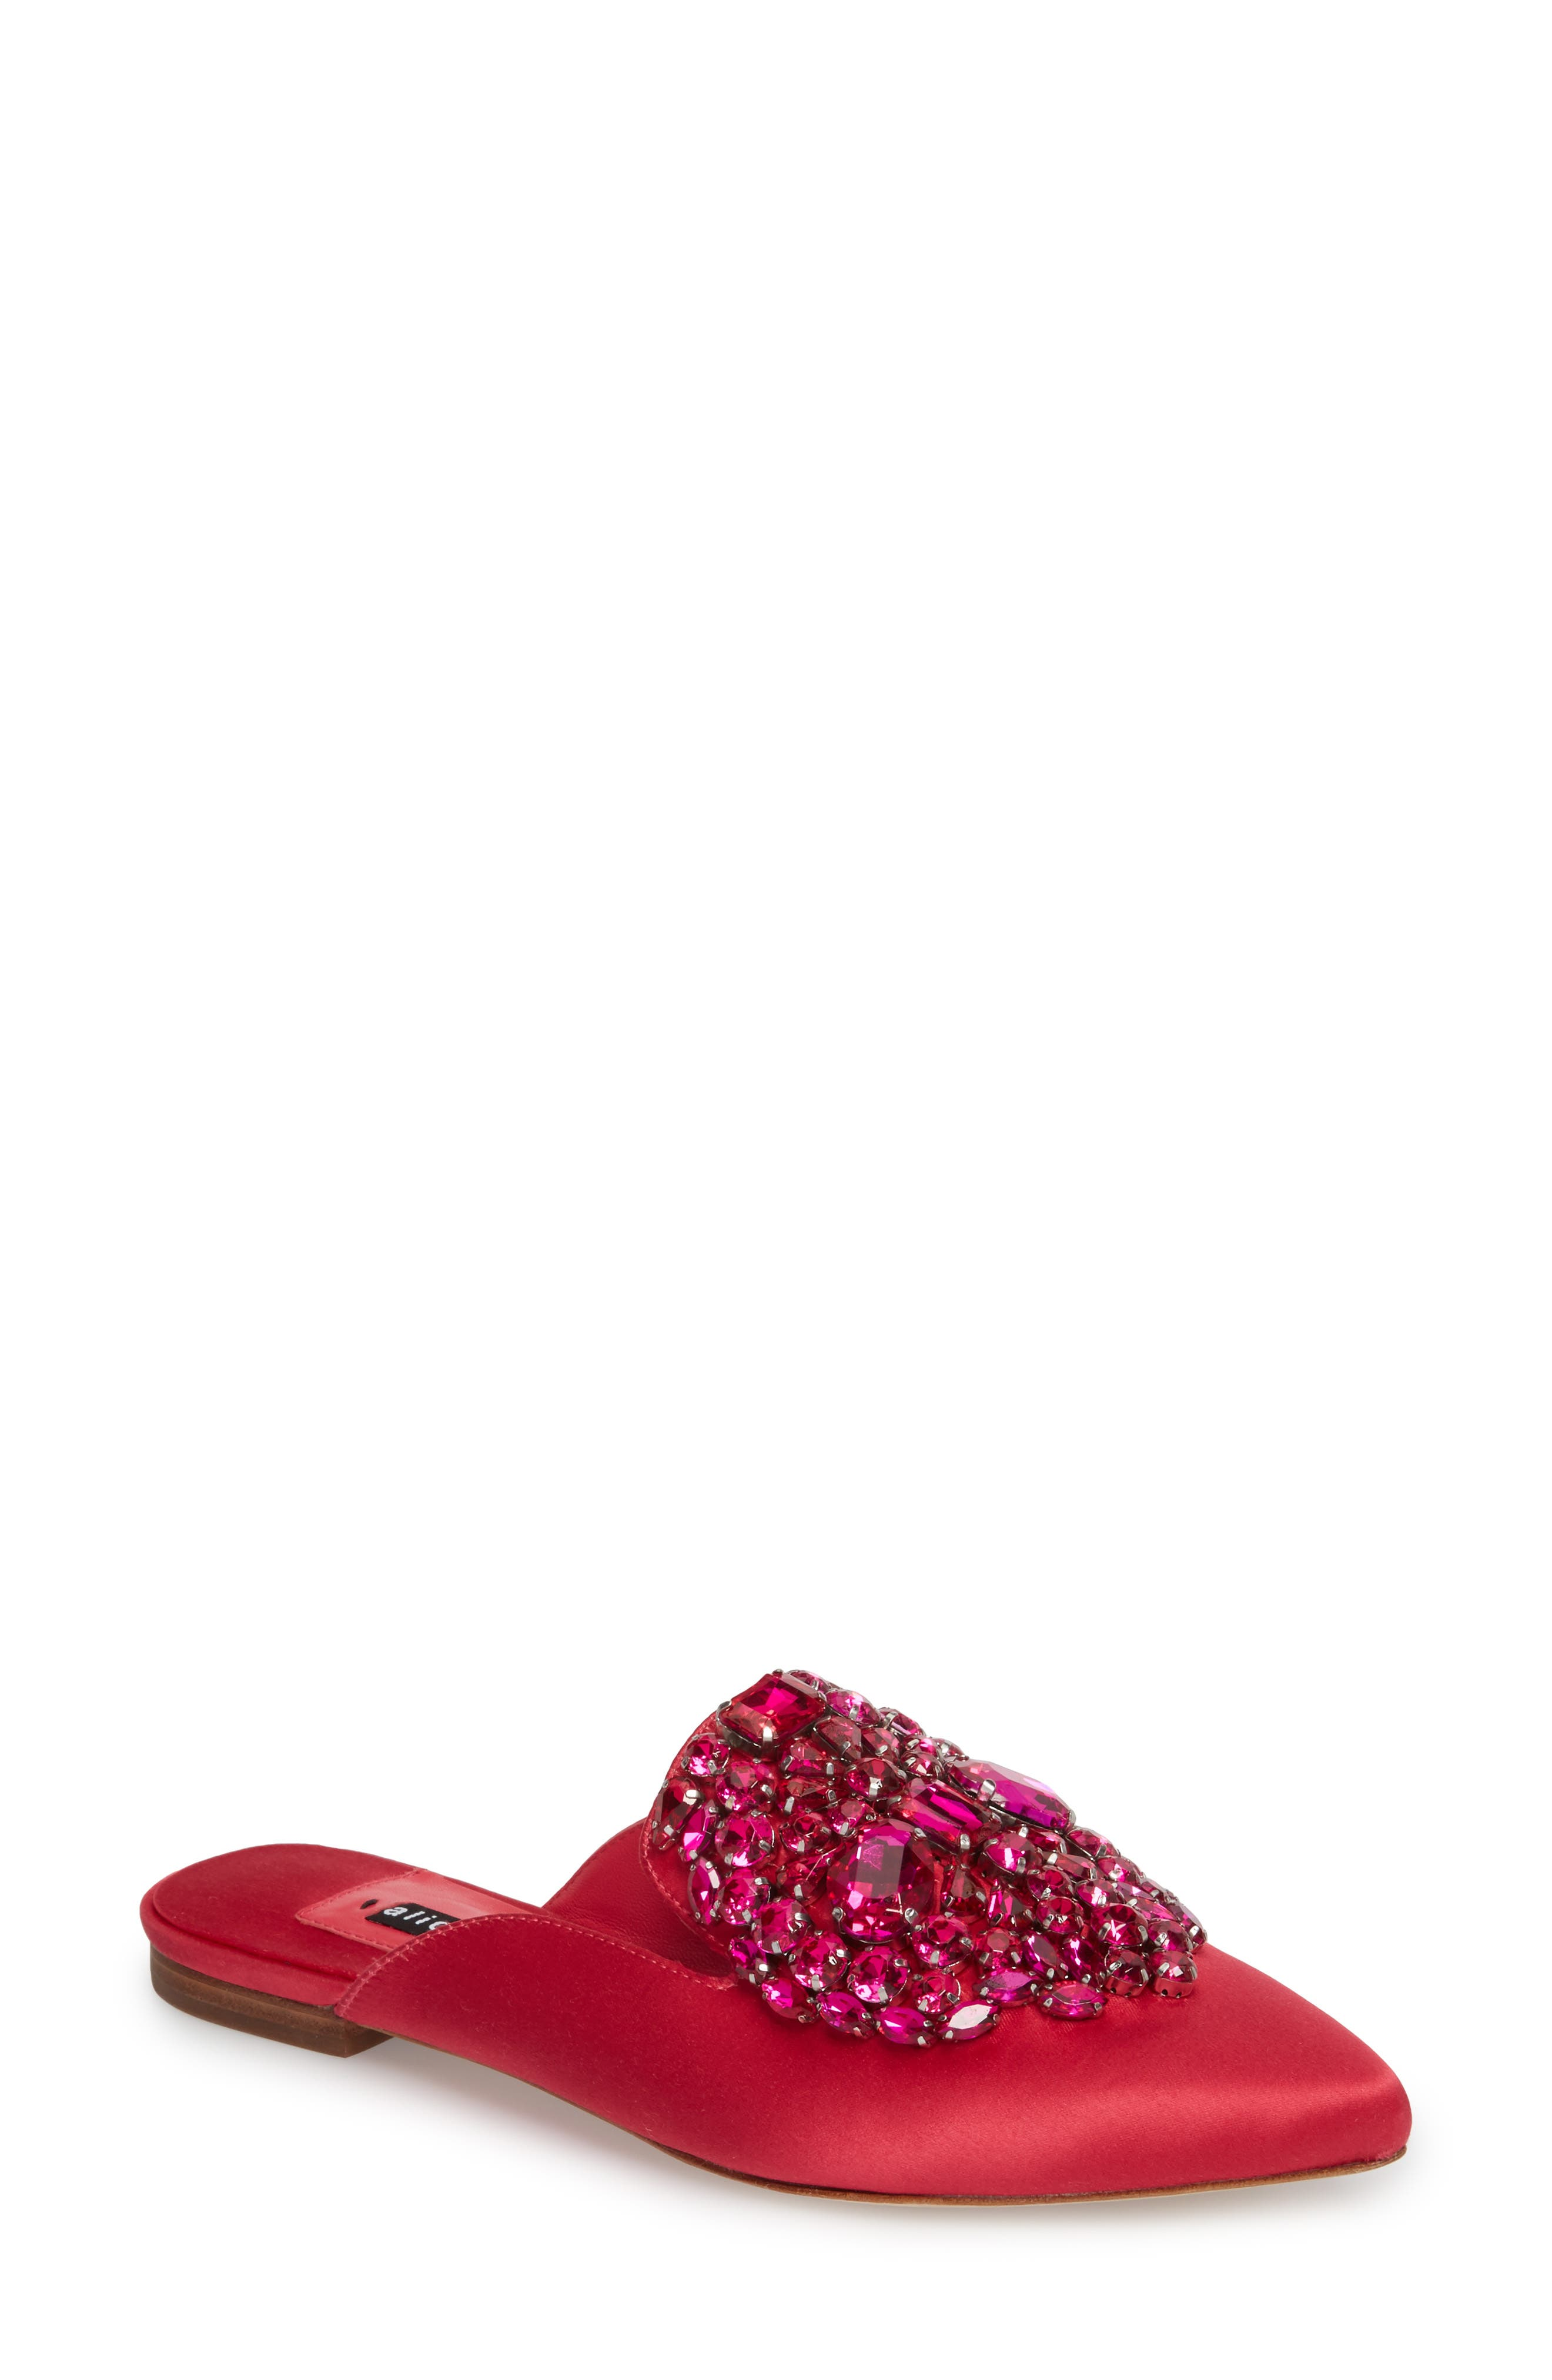 Lilly Crystal Embellished Loafer Mule,                         Main,                         color,